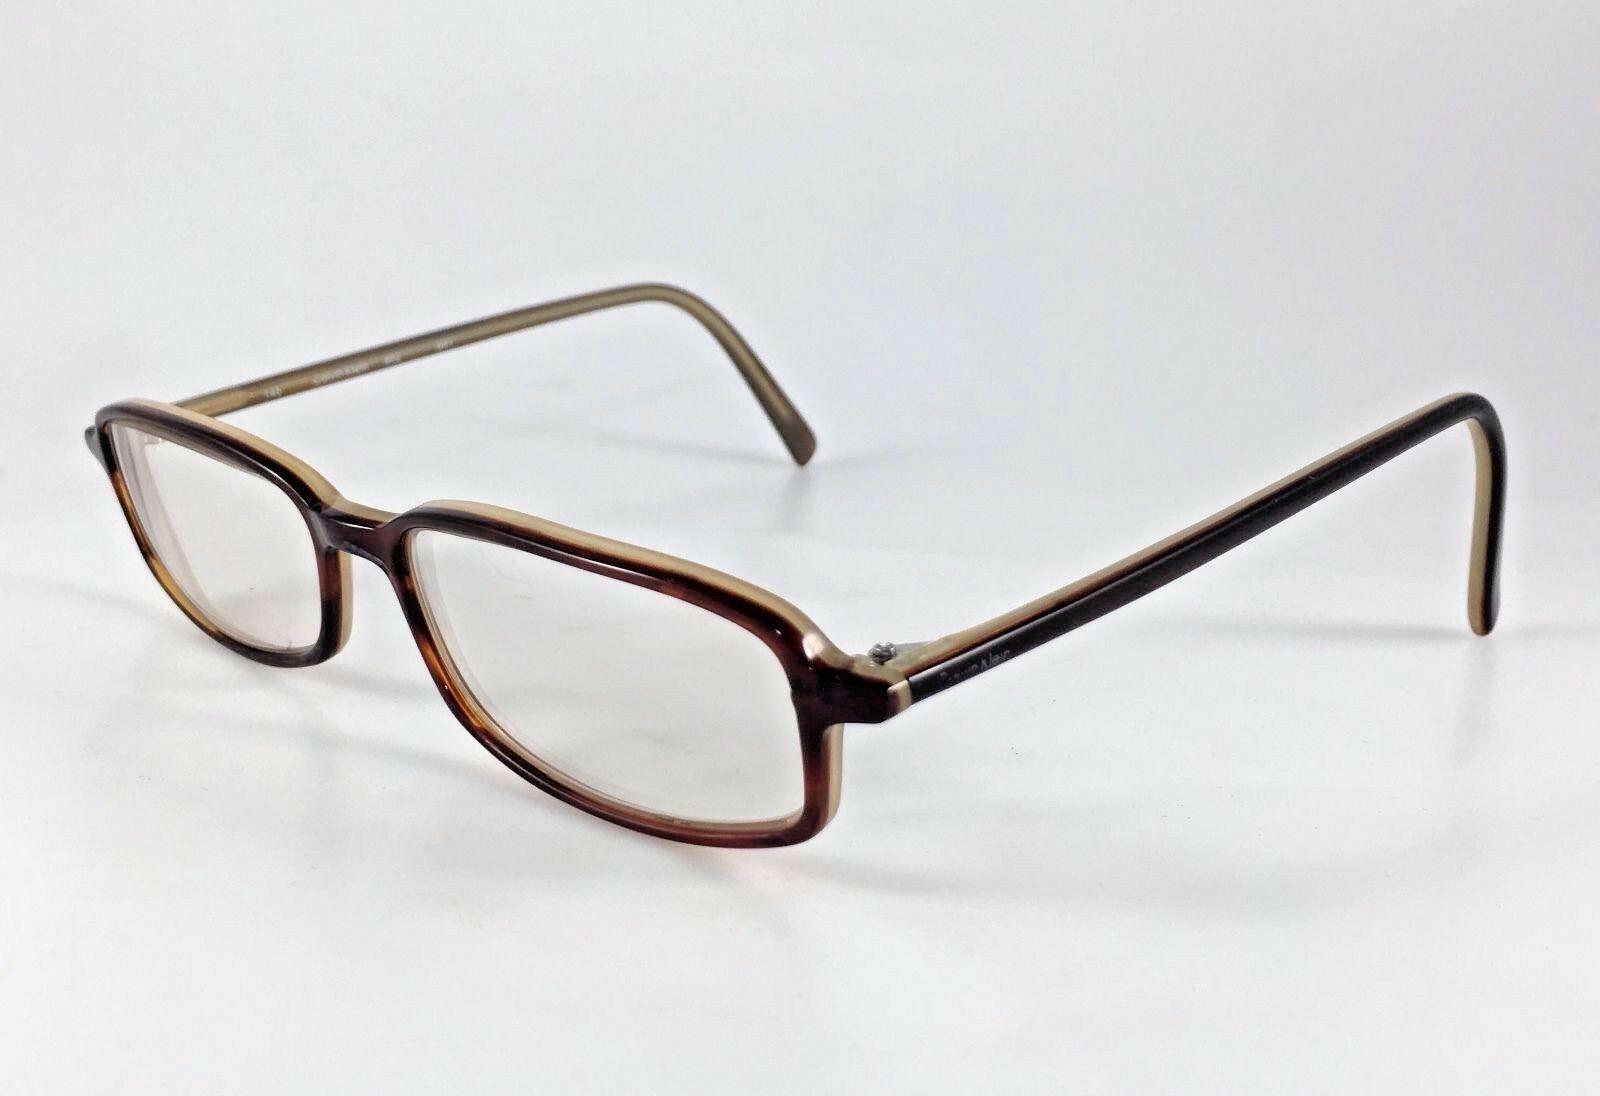 Calvin Klein Eyeglasses Eyeglass Frames Glasses 51 15 145 Eyewear RX 662 041